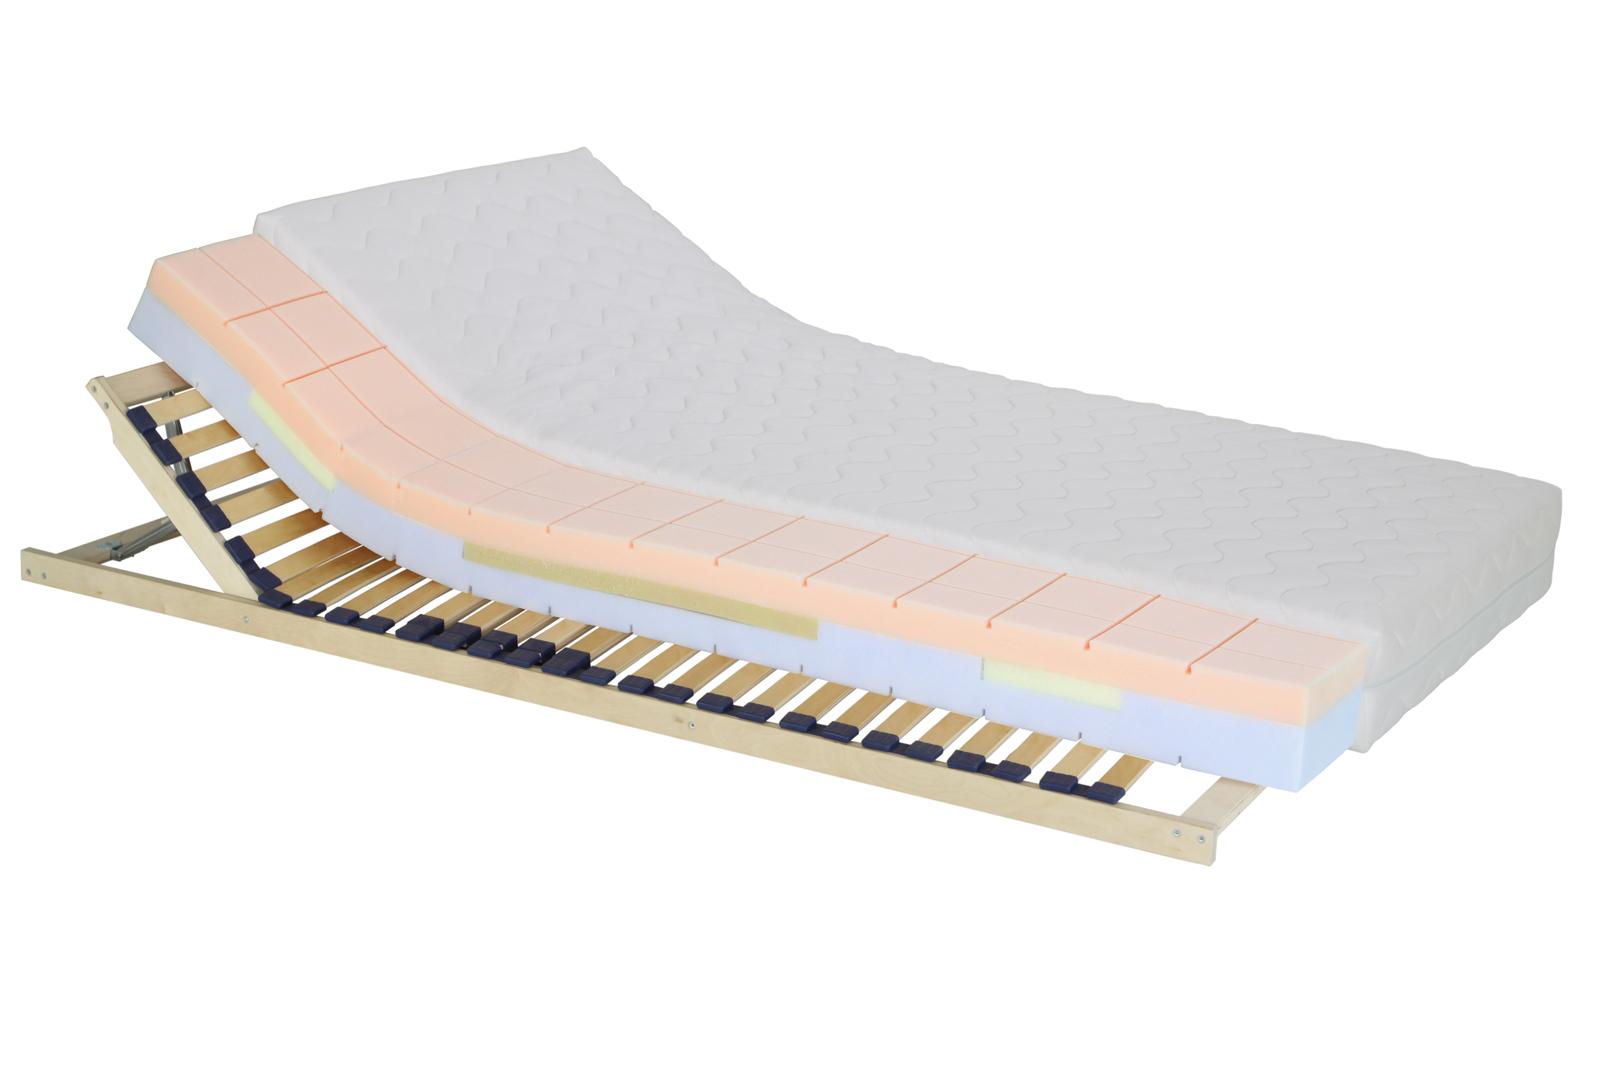 Penový matrac - Tempo Kondela - Tempo 20, 200x160 cm